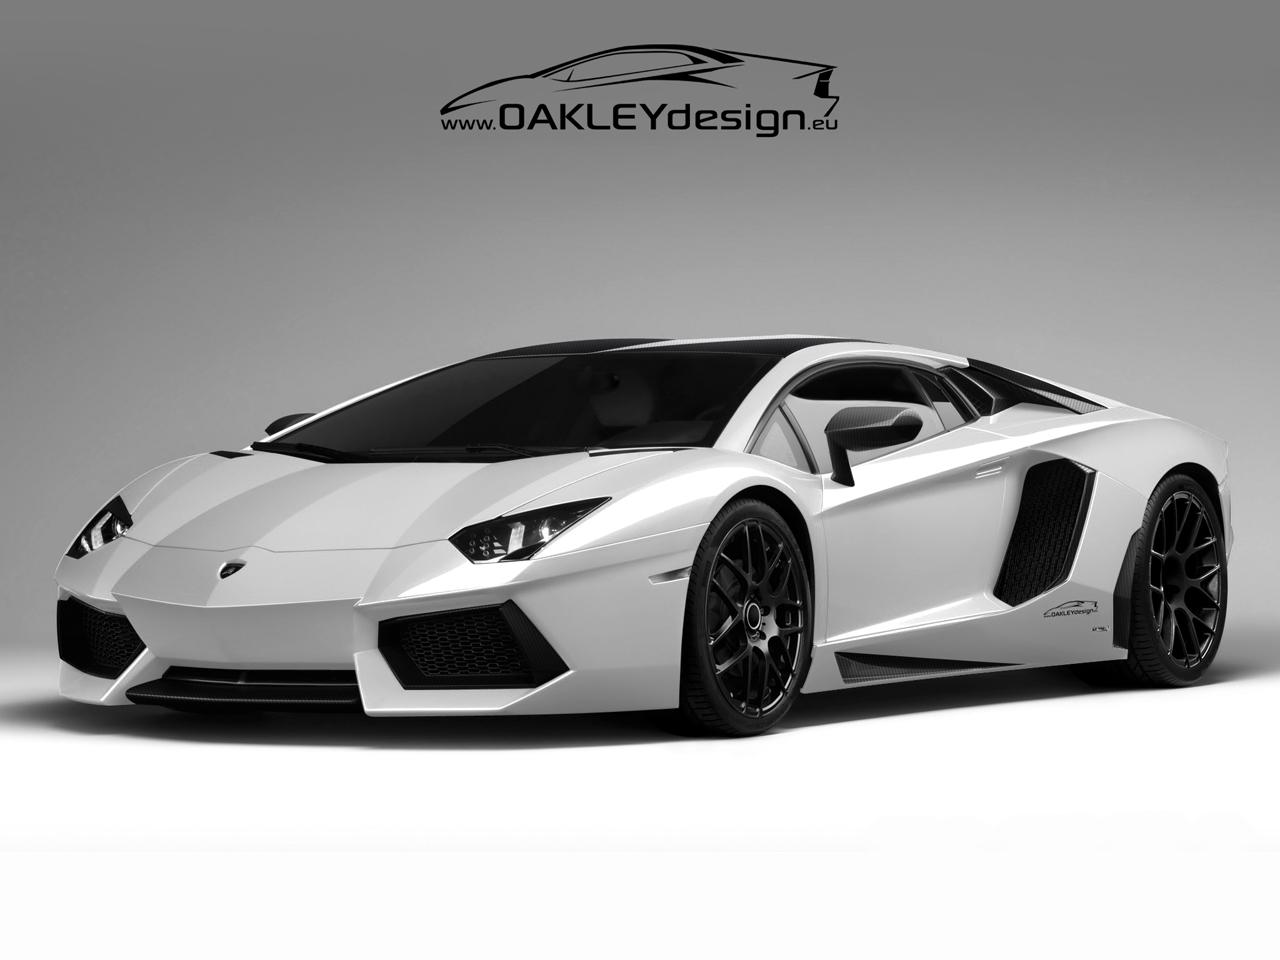 Oakley Design Lamborghini Aventador Wallpaper Download